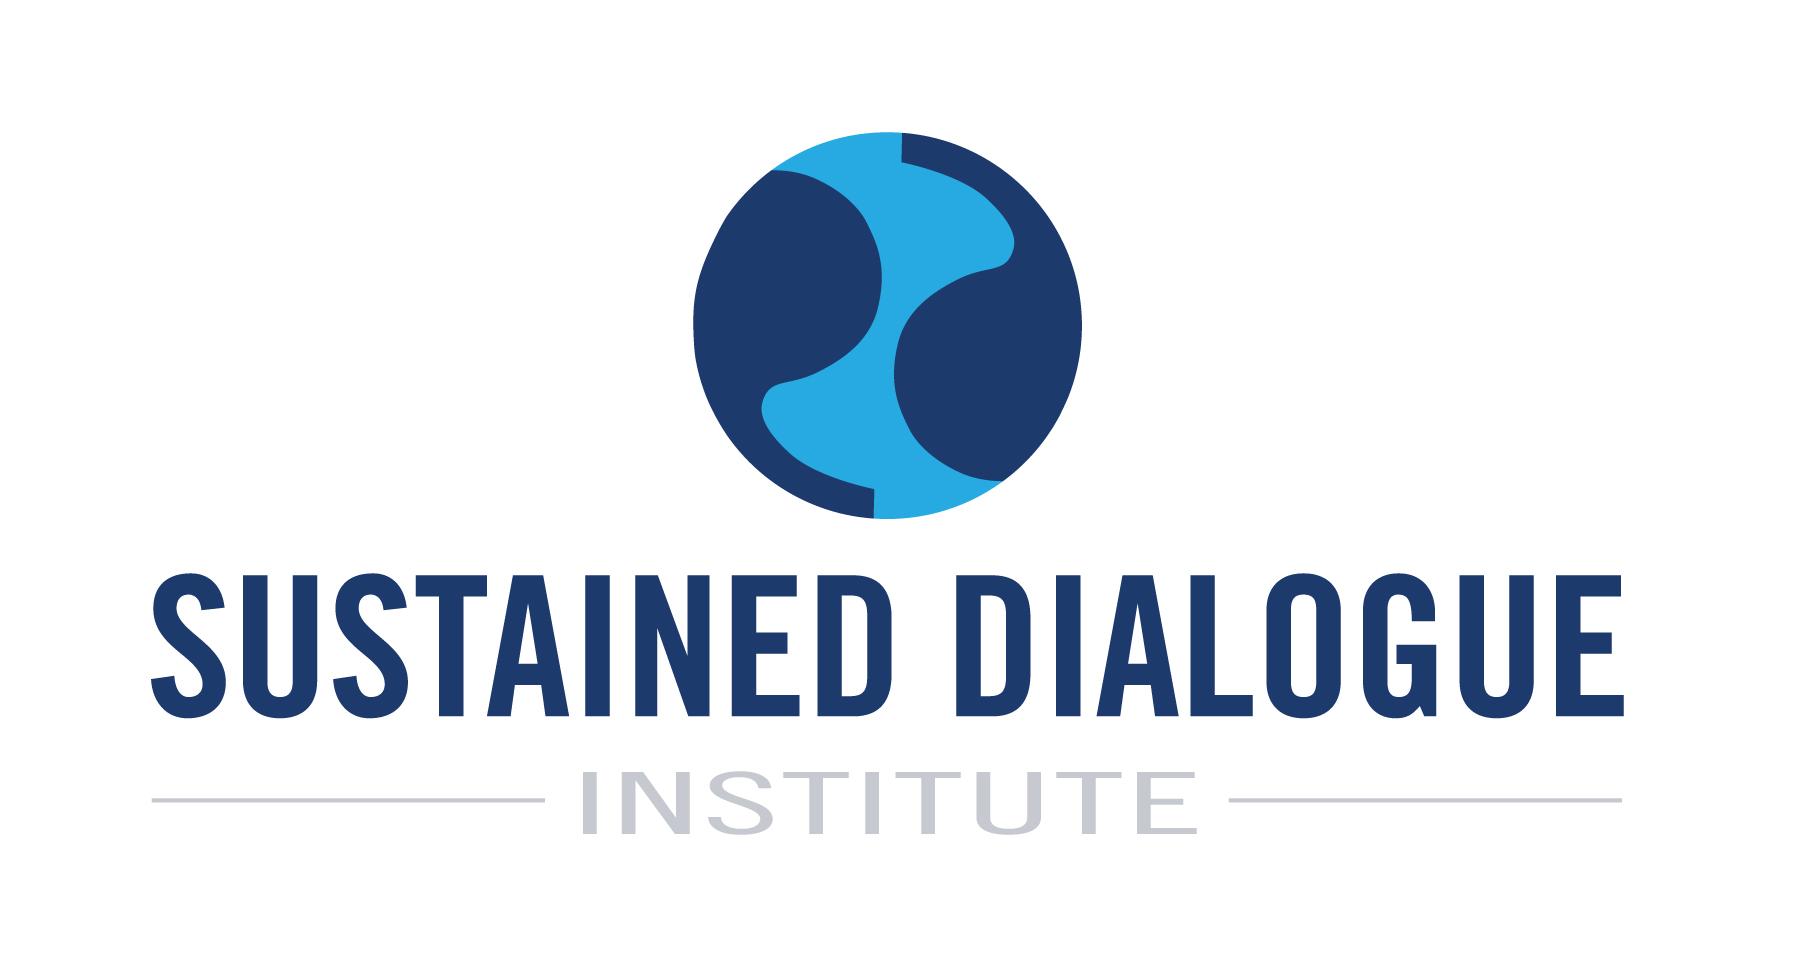 Sustained Dialogue Institute